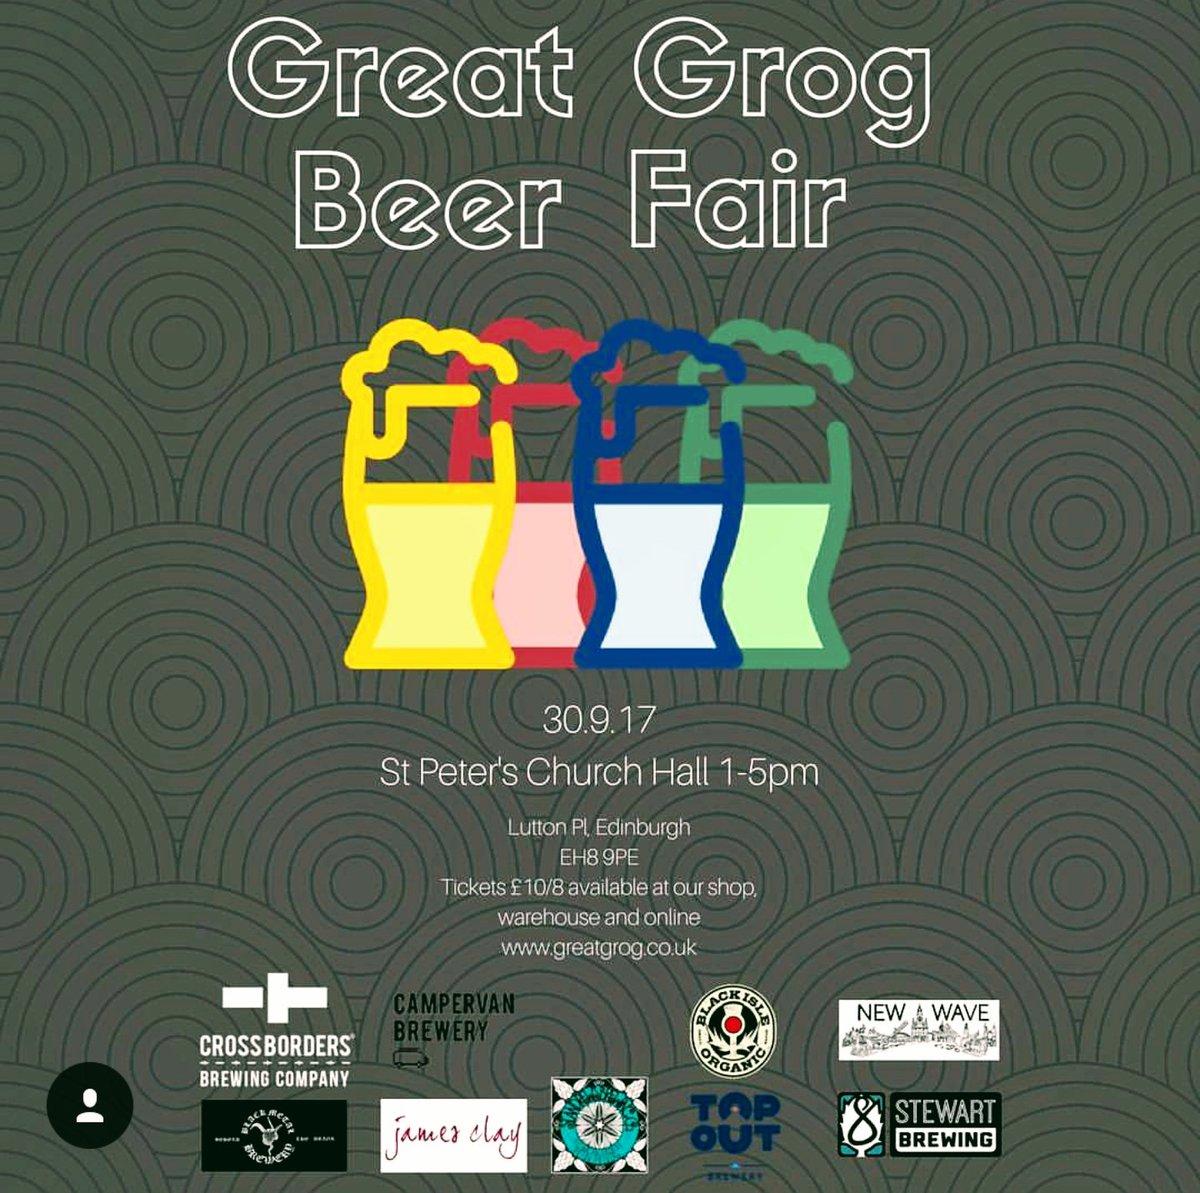 Meet the brewers #craftbeer bottled #beerfair #Edinburgh Sat 30th Sept 1-5pm tickets @GreatGrogShop or 01315550222<br>http://pic.twitter.com/BKjoMUPDp3